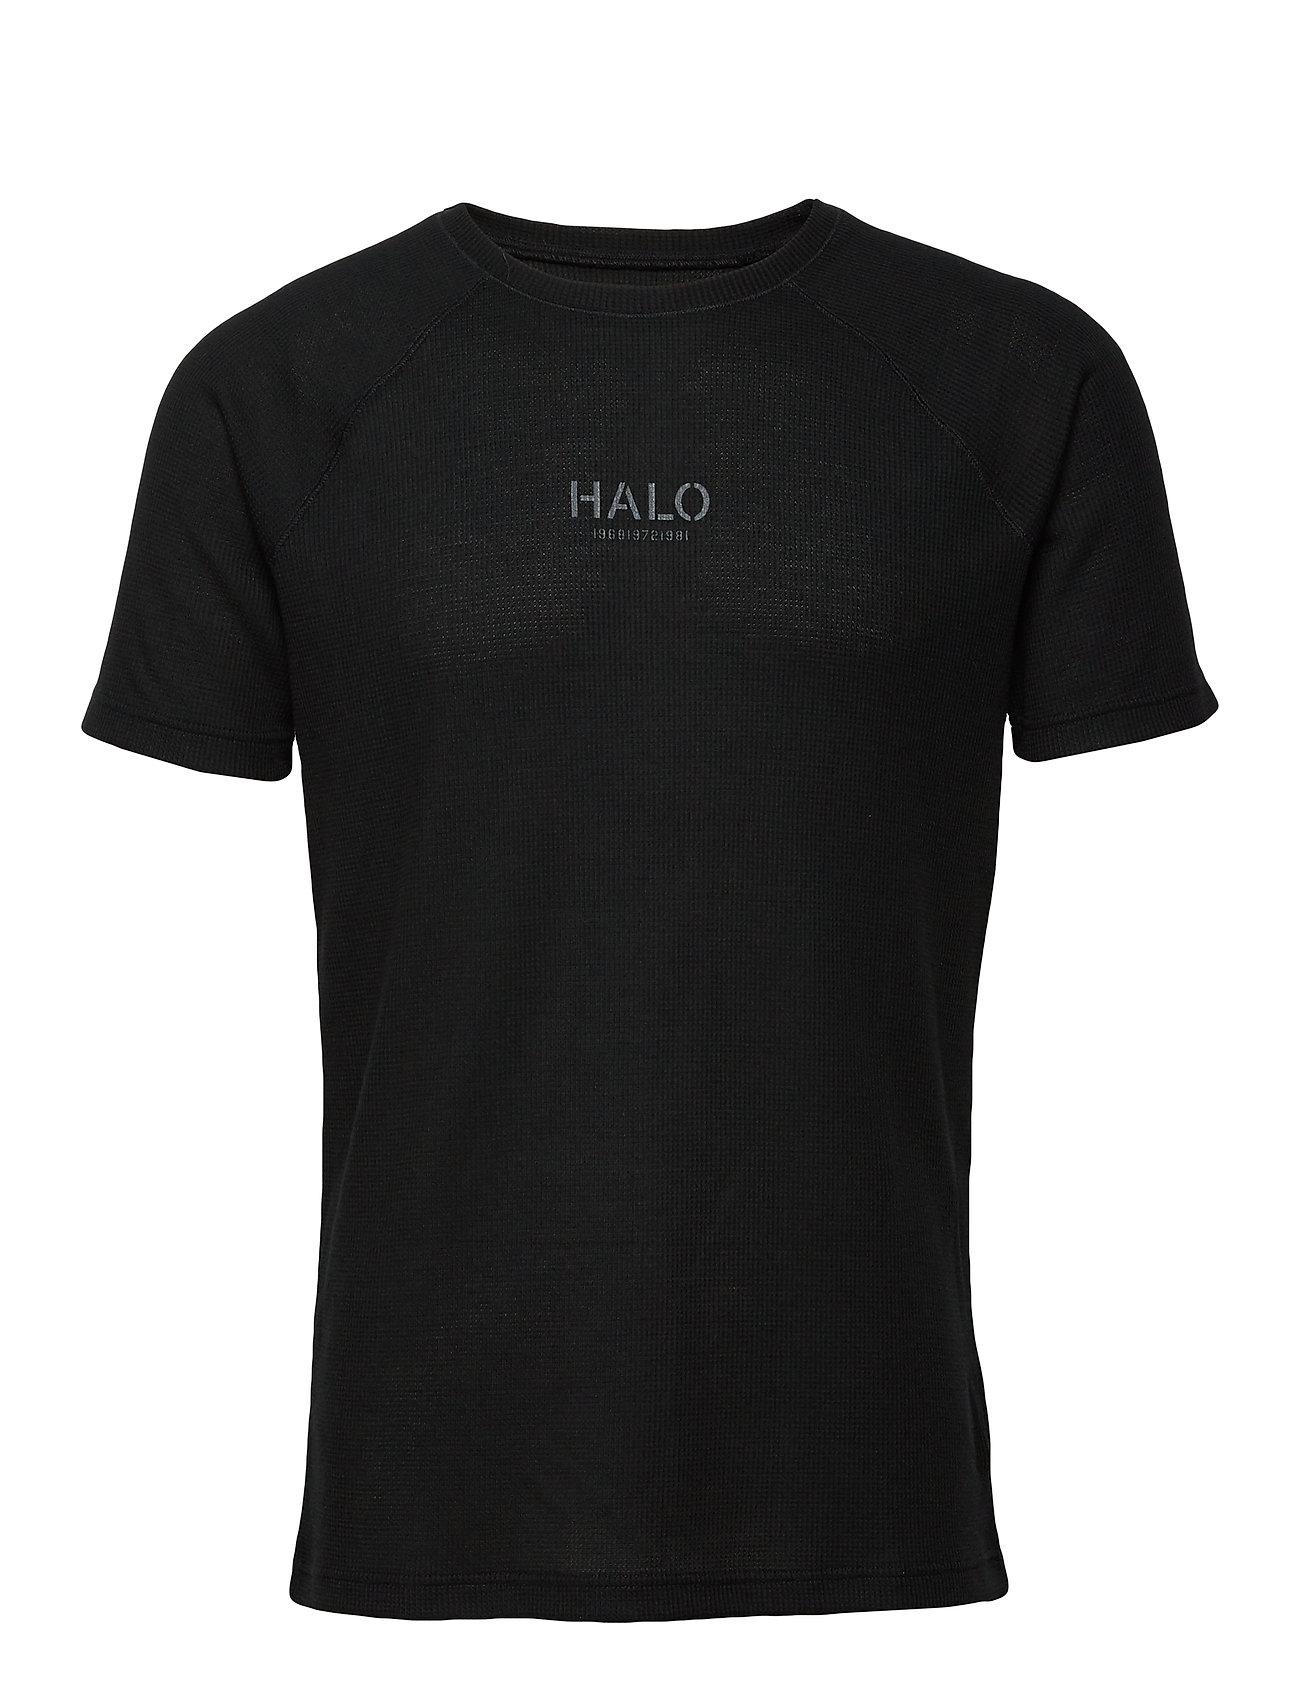 HALO HALO Military Tee - BLACK